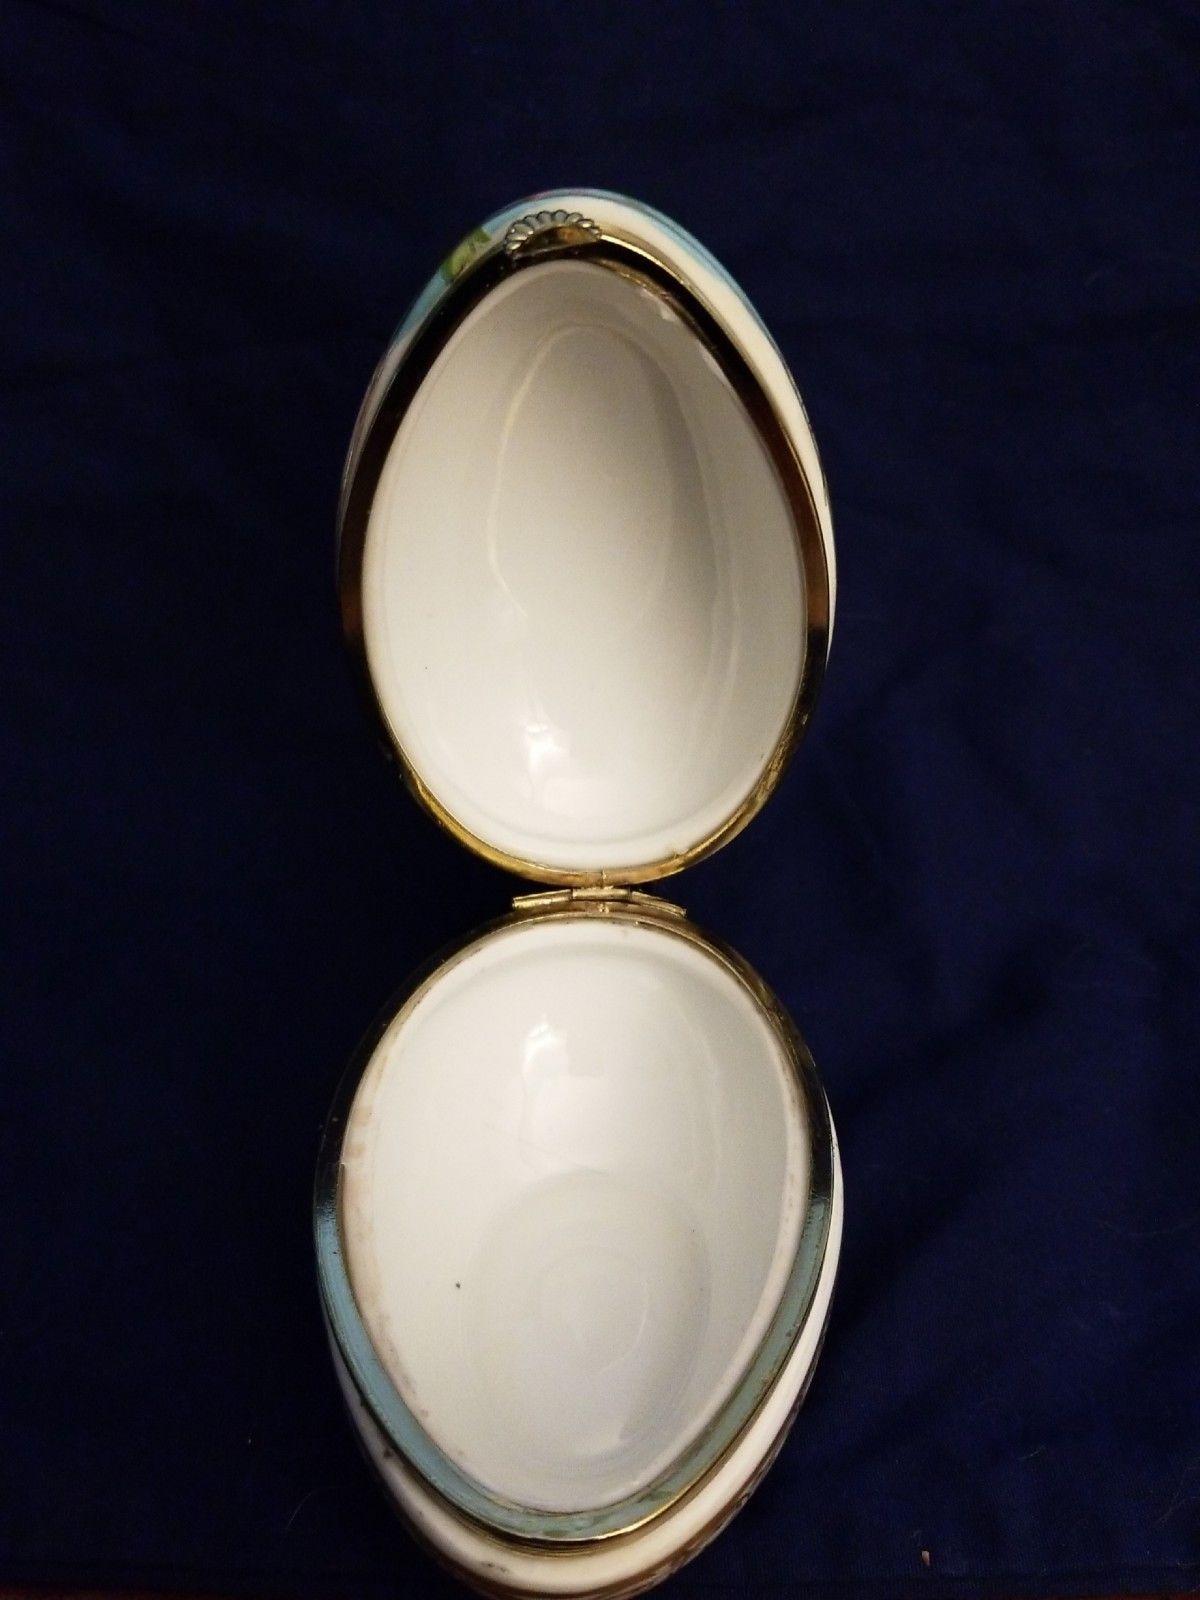 Lefton Decorated Porcelain Egg Jewelry Trinket Box XA-8068 - $5.94